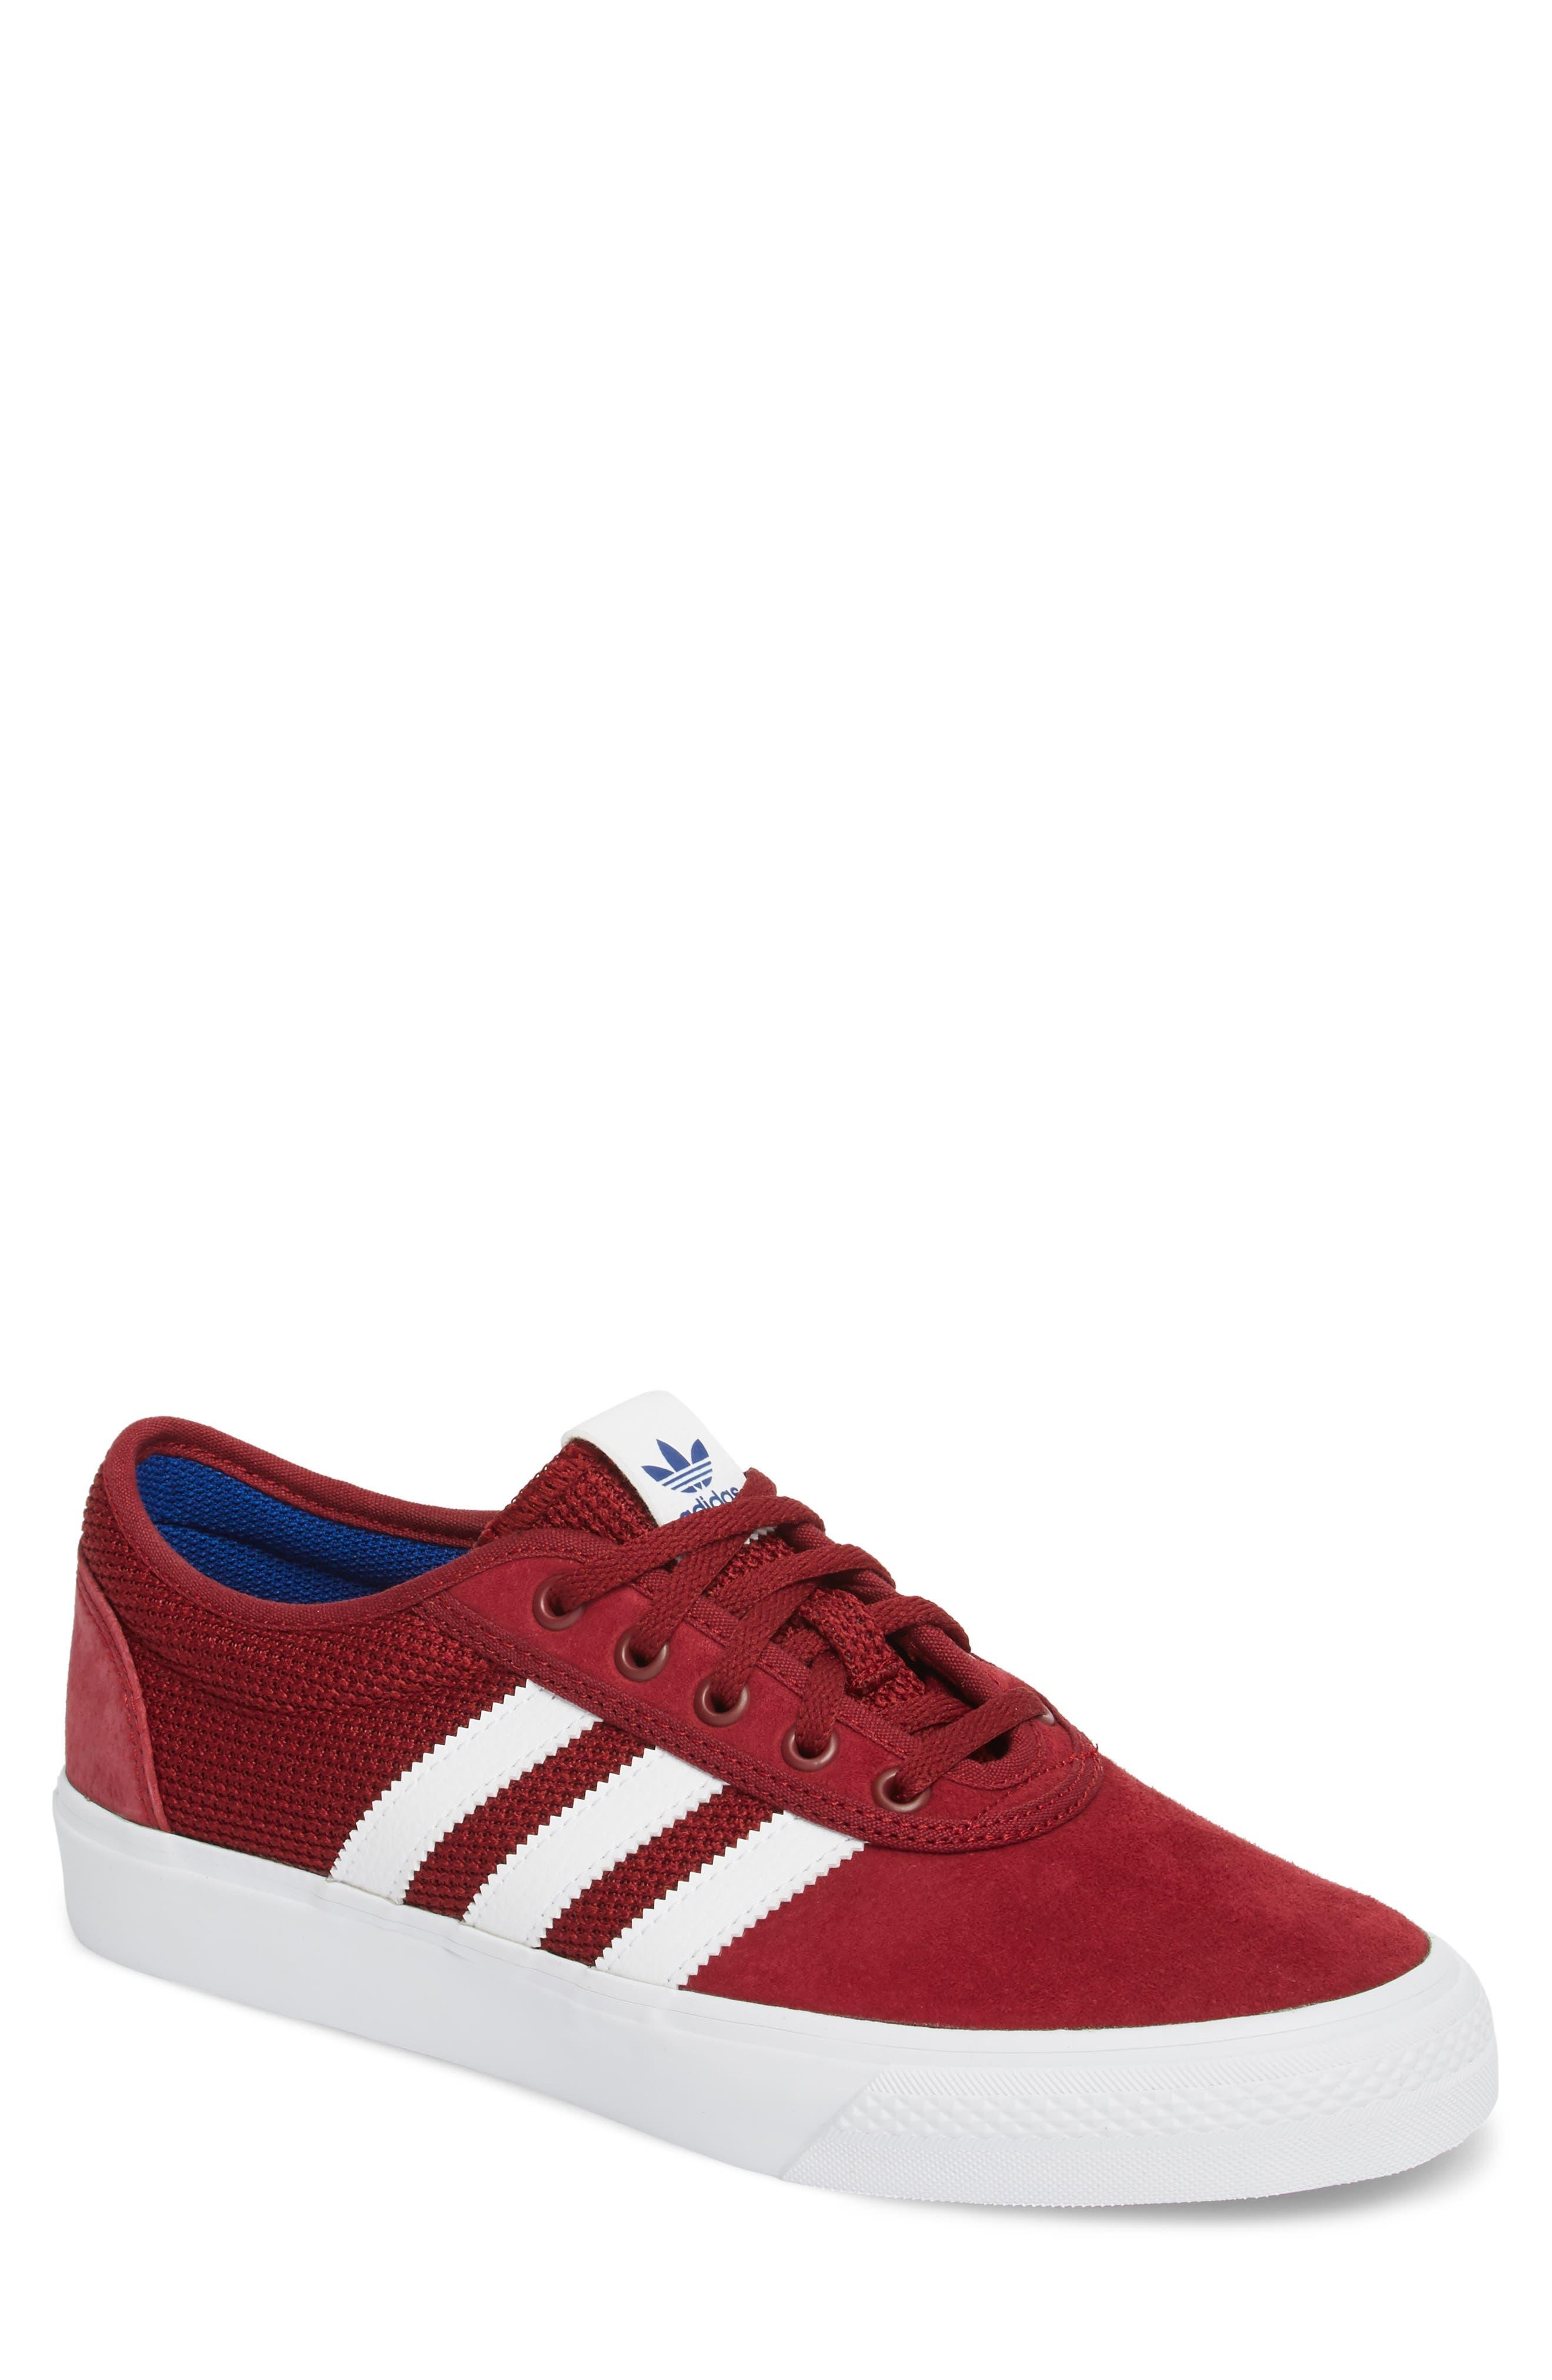 adi-Ease Sneaker,                             Main thumbnail 1, color,                             Burgundy/ White / Royal